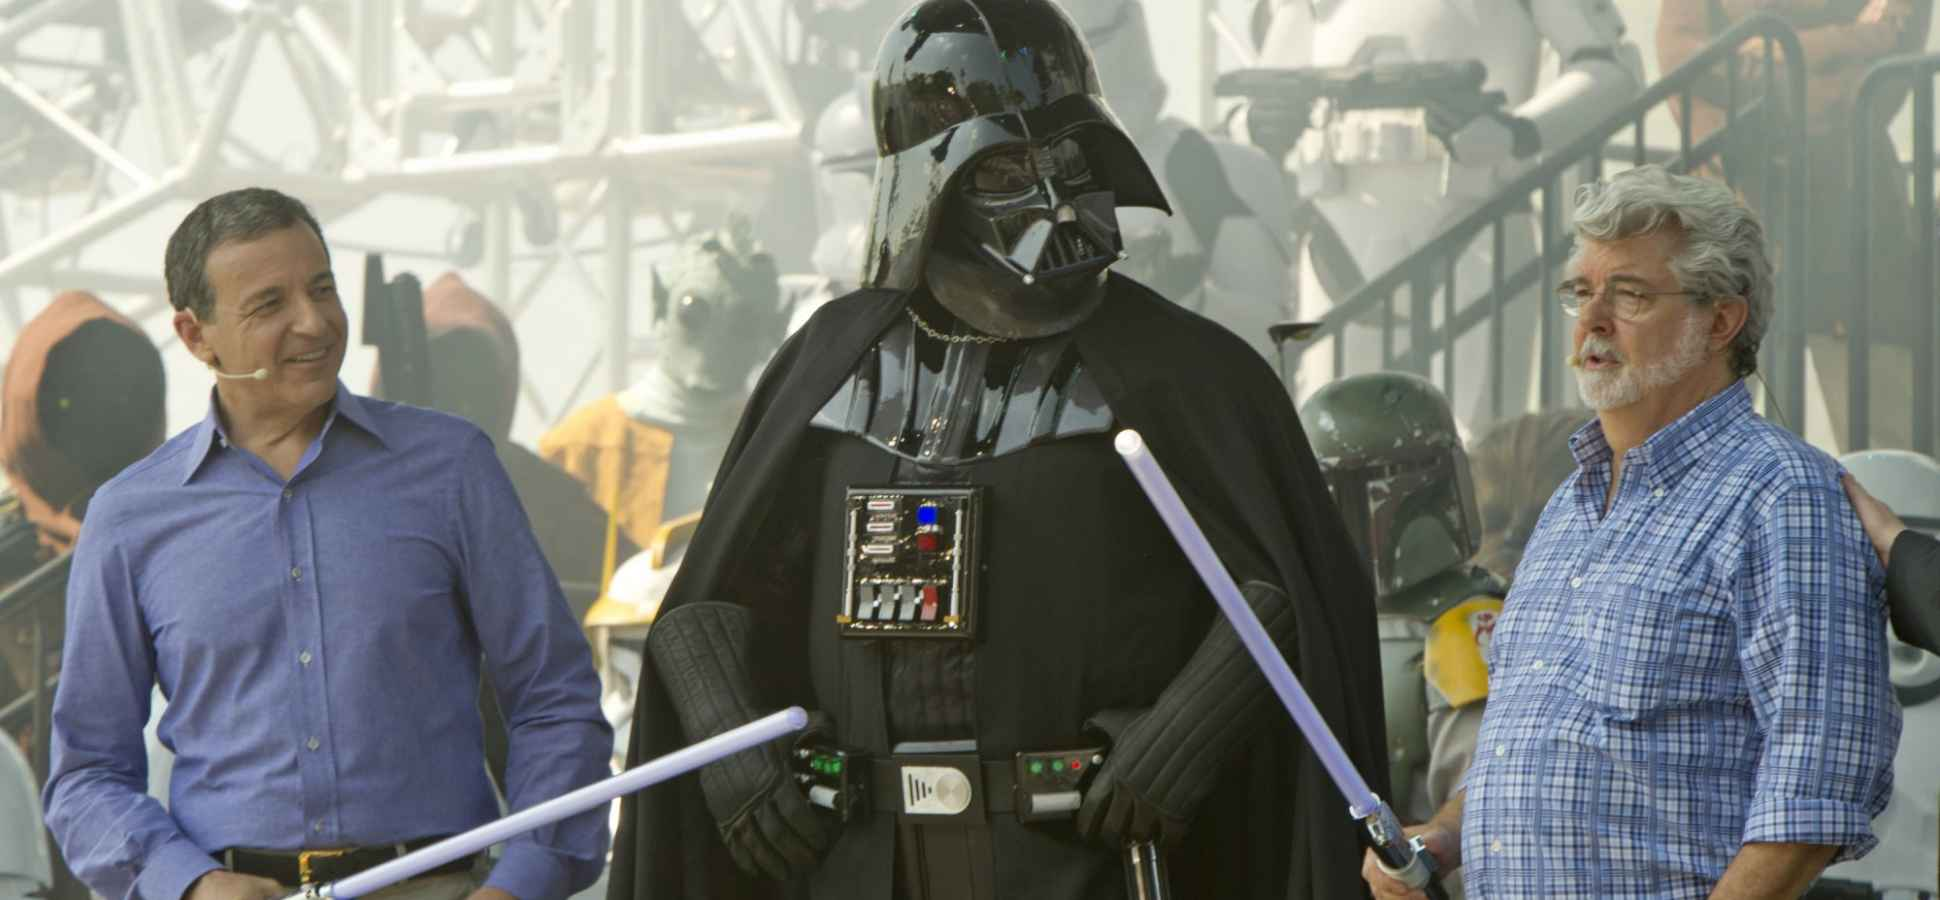 5 Jedi Mind Tricks to Dramatically Improve Your Performance